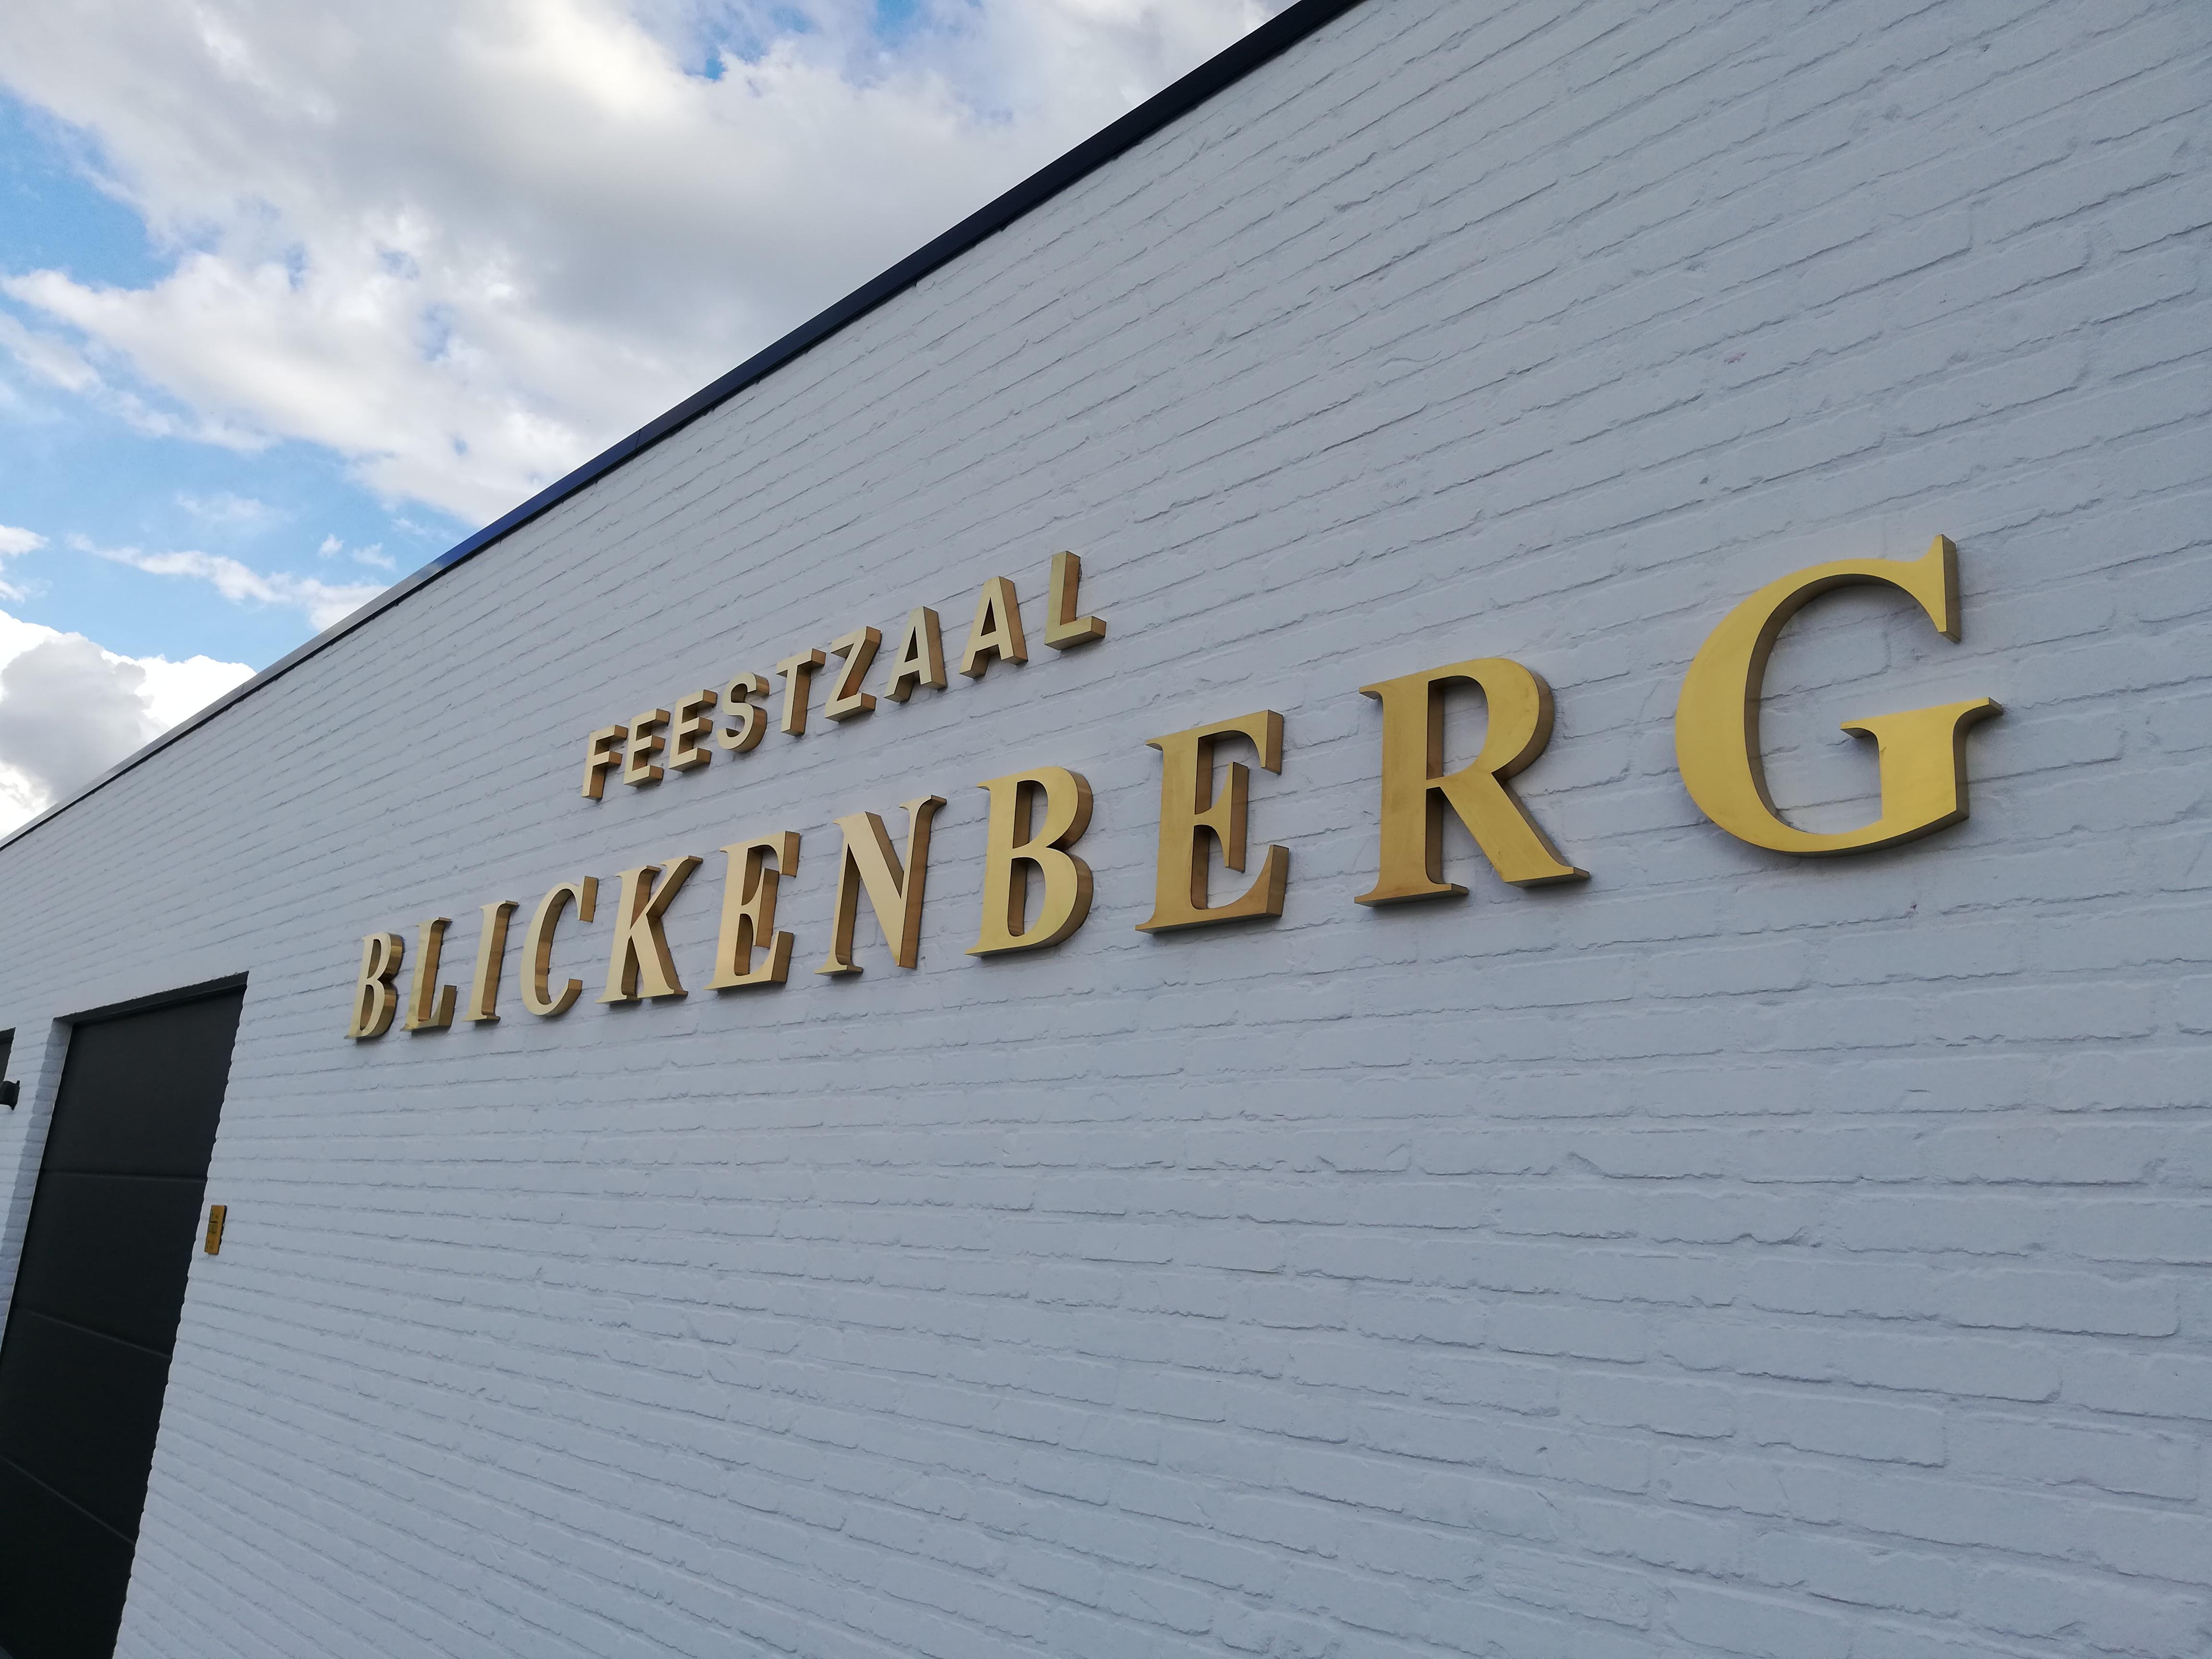 Feestzaal Blickenberg